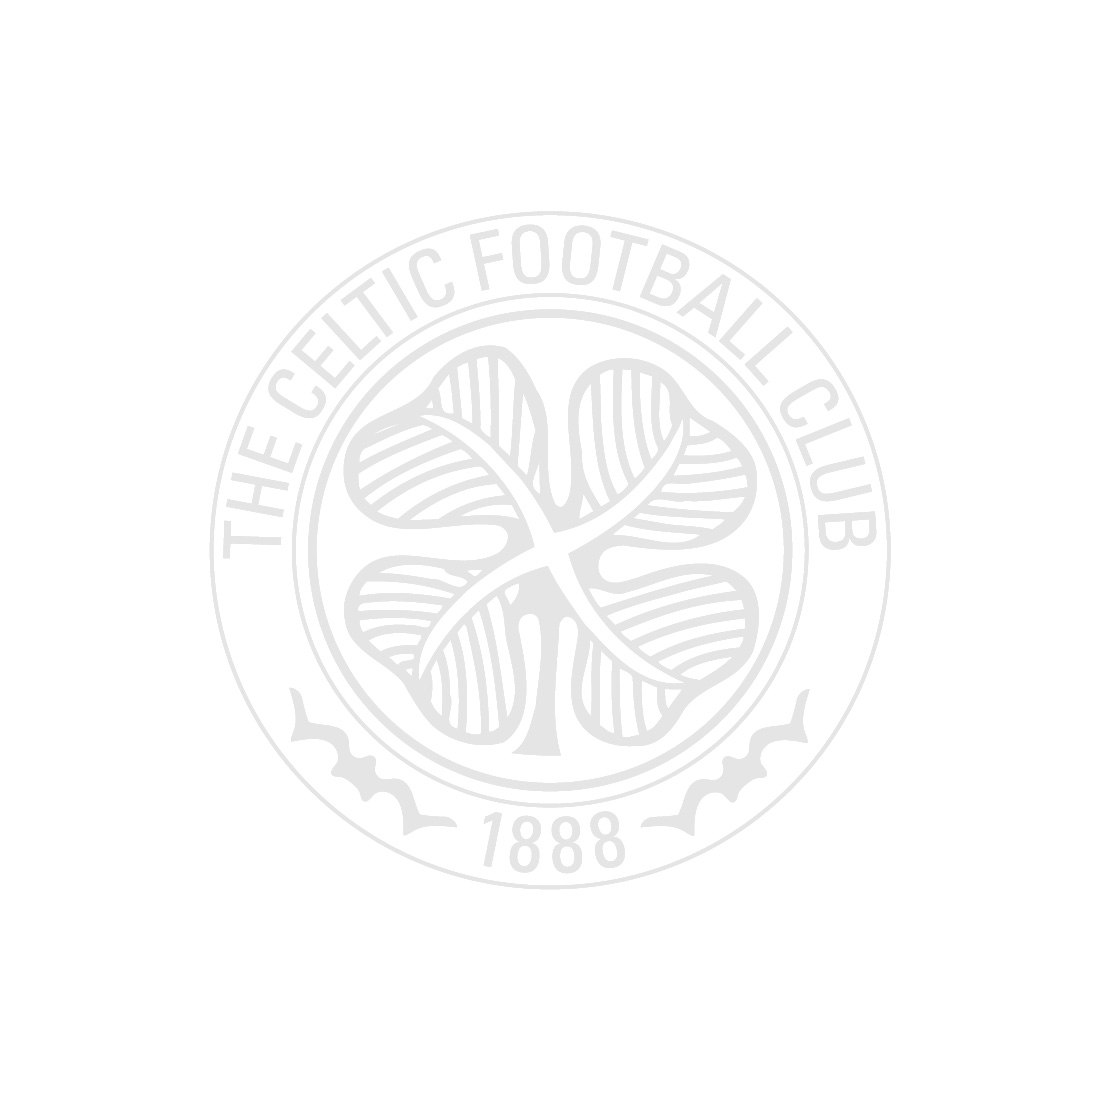 Celtic Personalised Hooped Large Towel